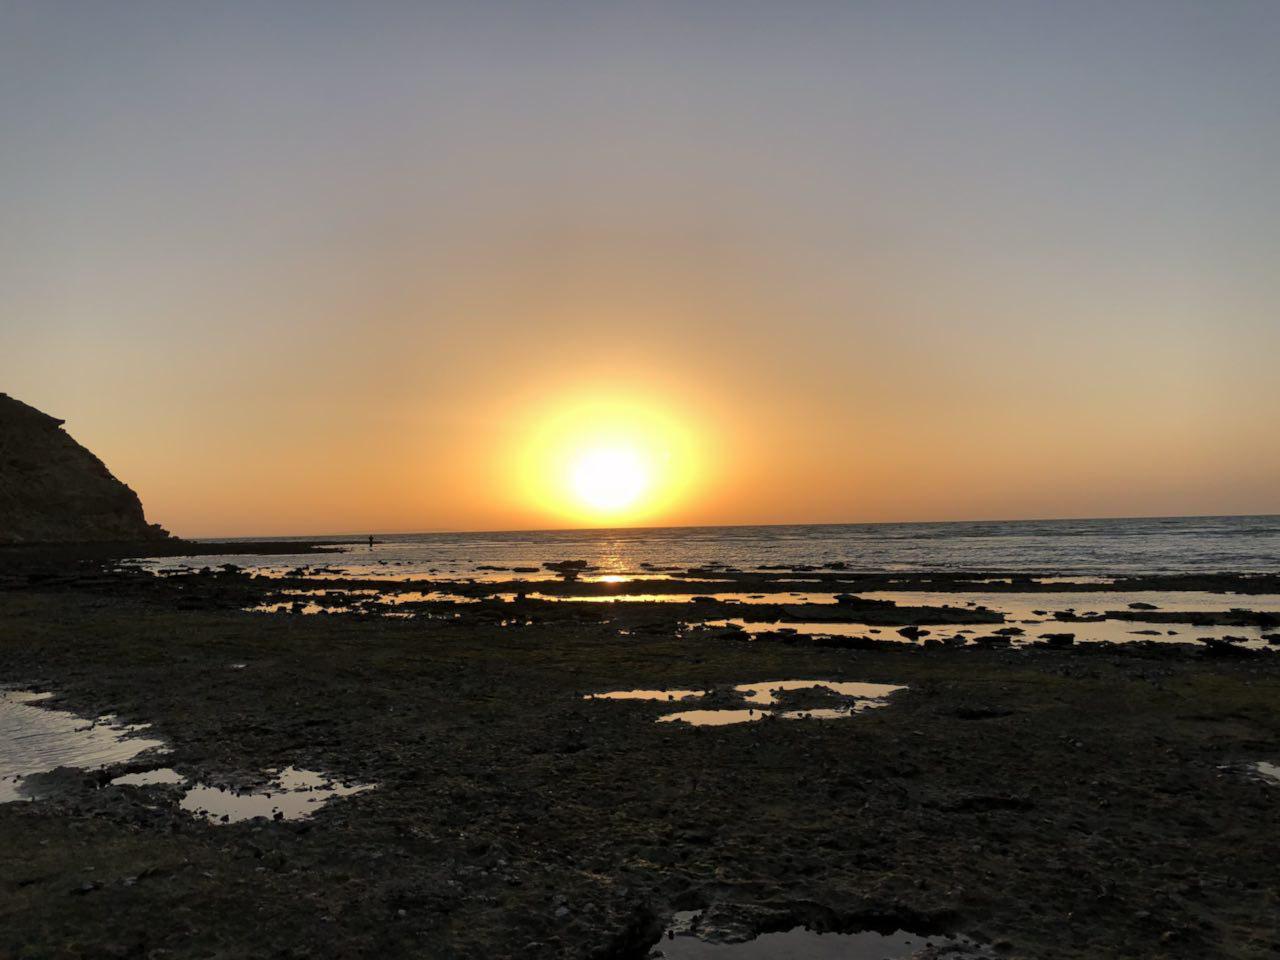 سواحل مرجانی تیس